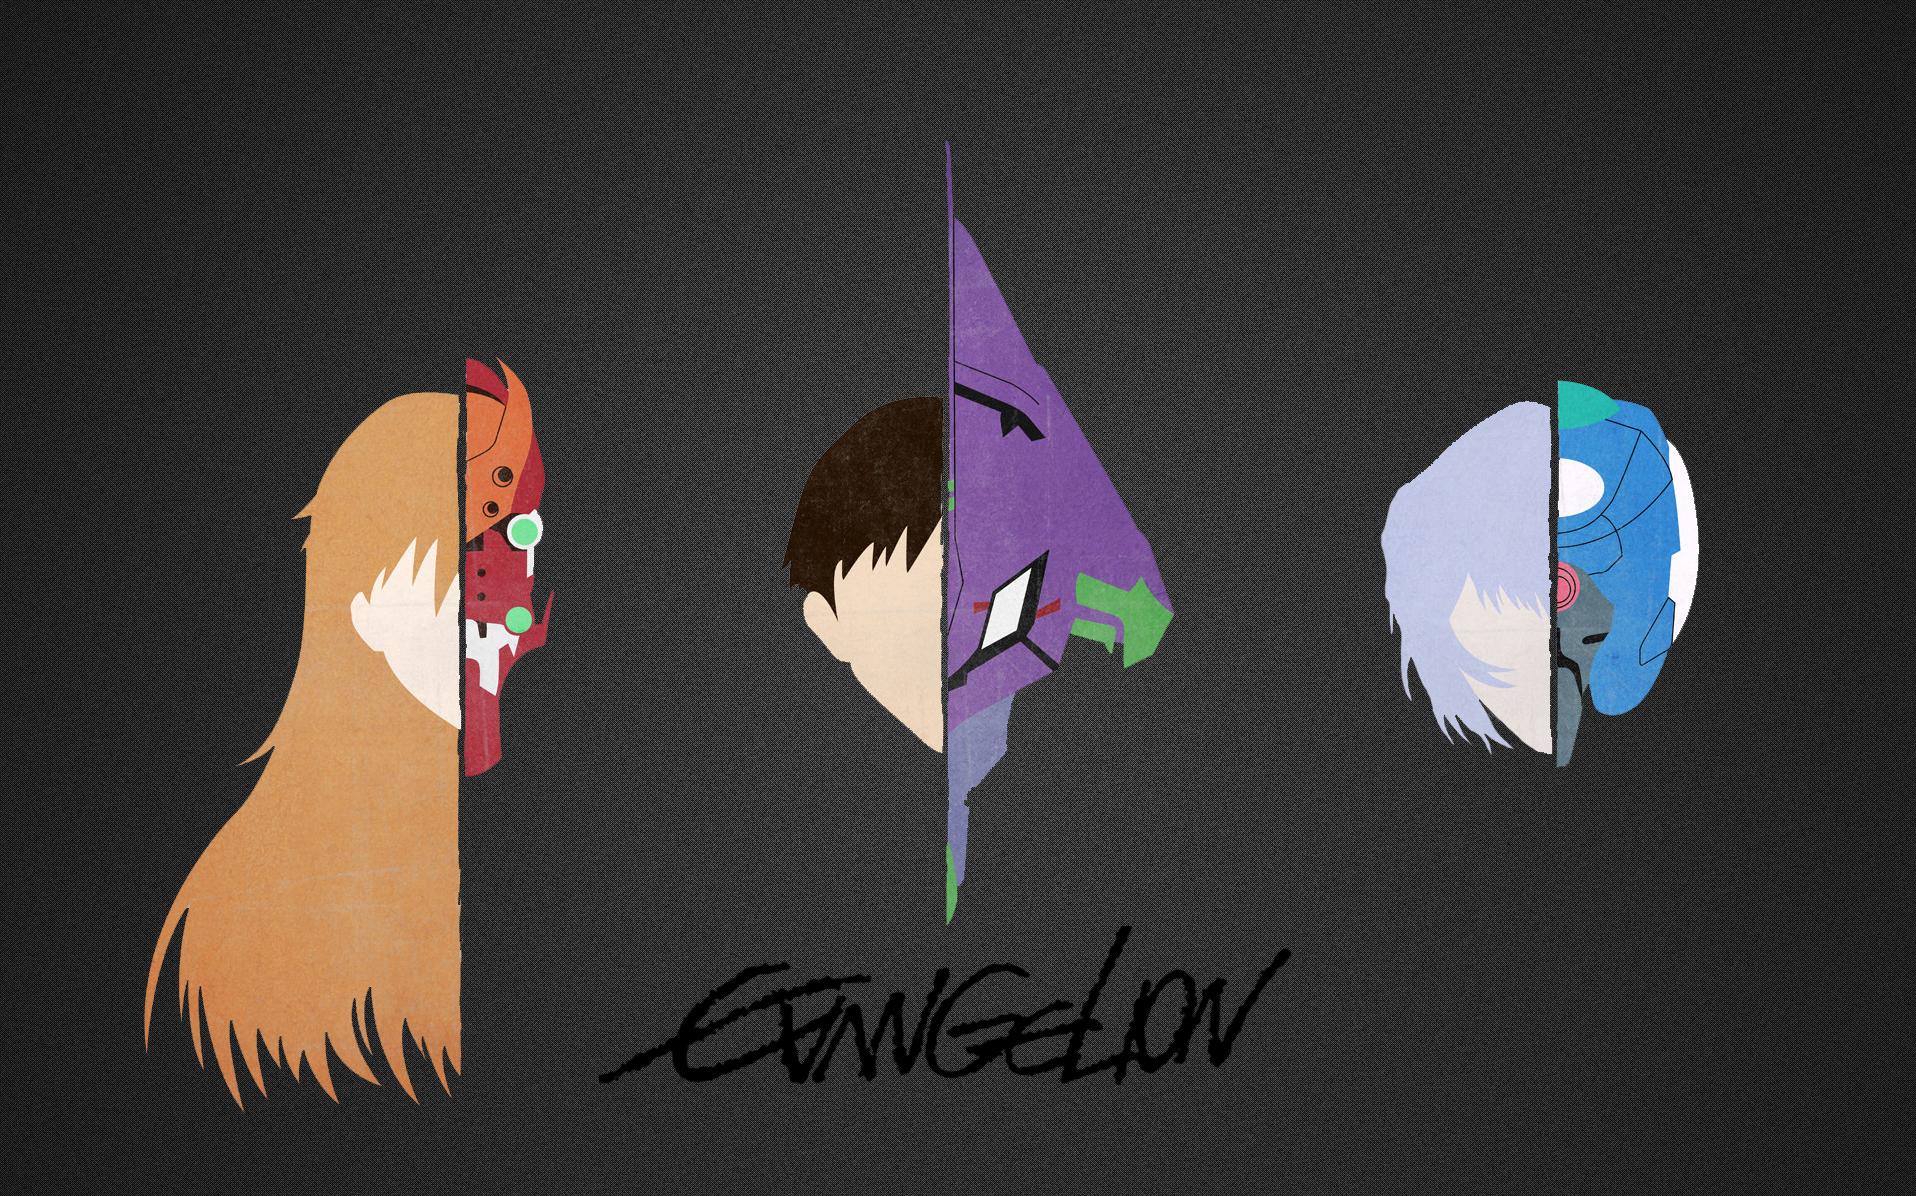 anime neon genesis evangelion wallpaper